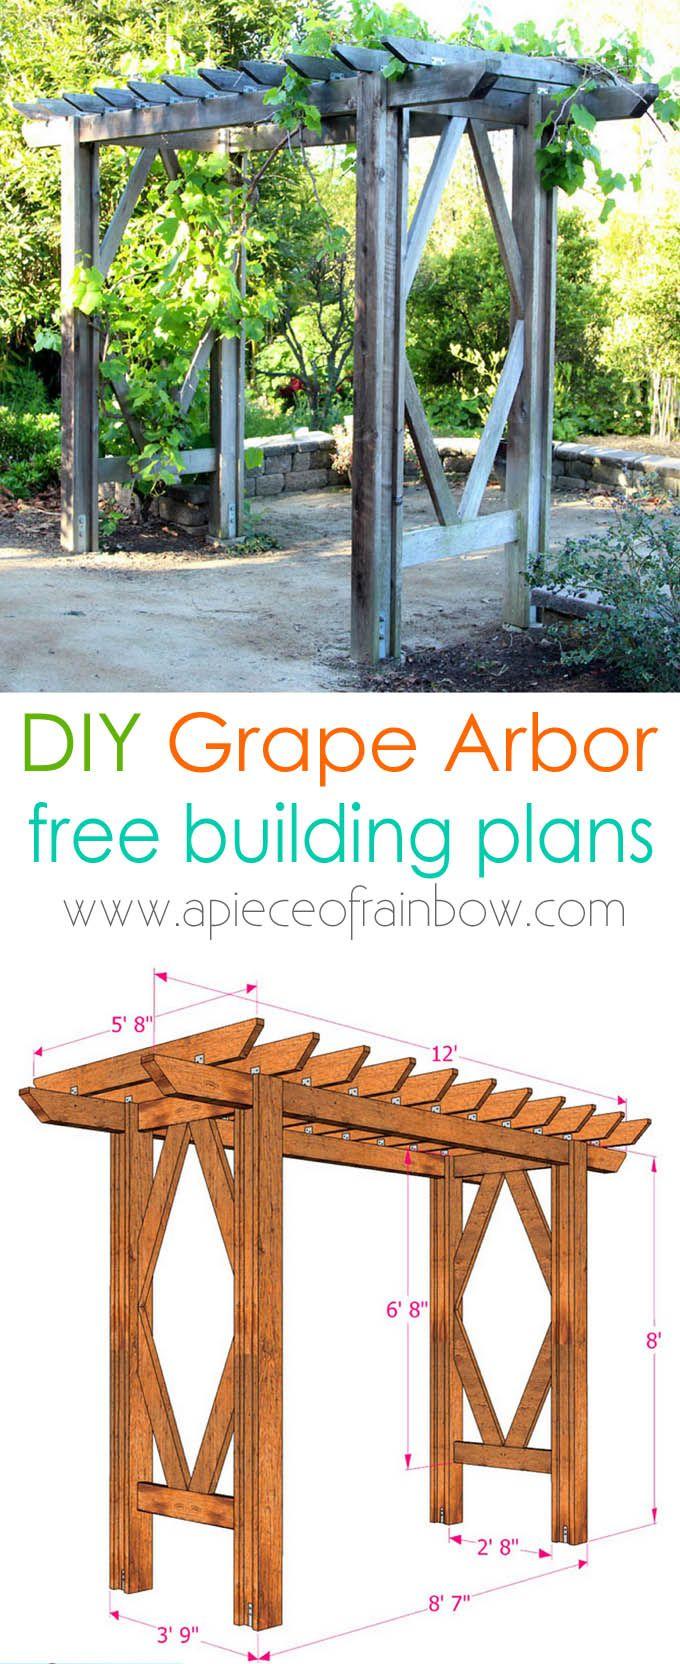 Simple Diy Pergola Grape Arbor Free Building Plan Diy